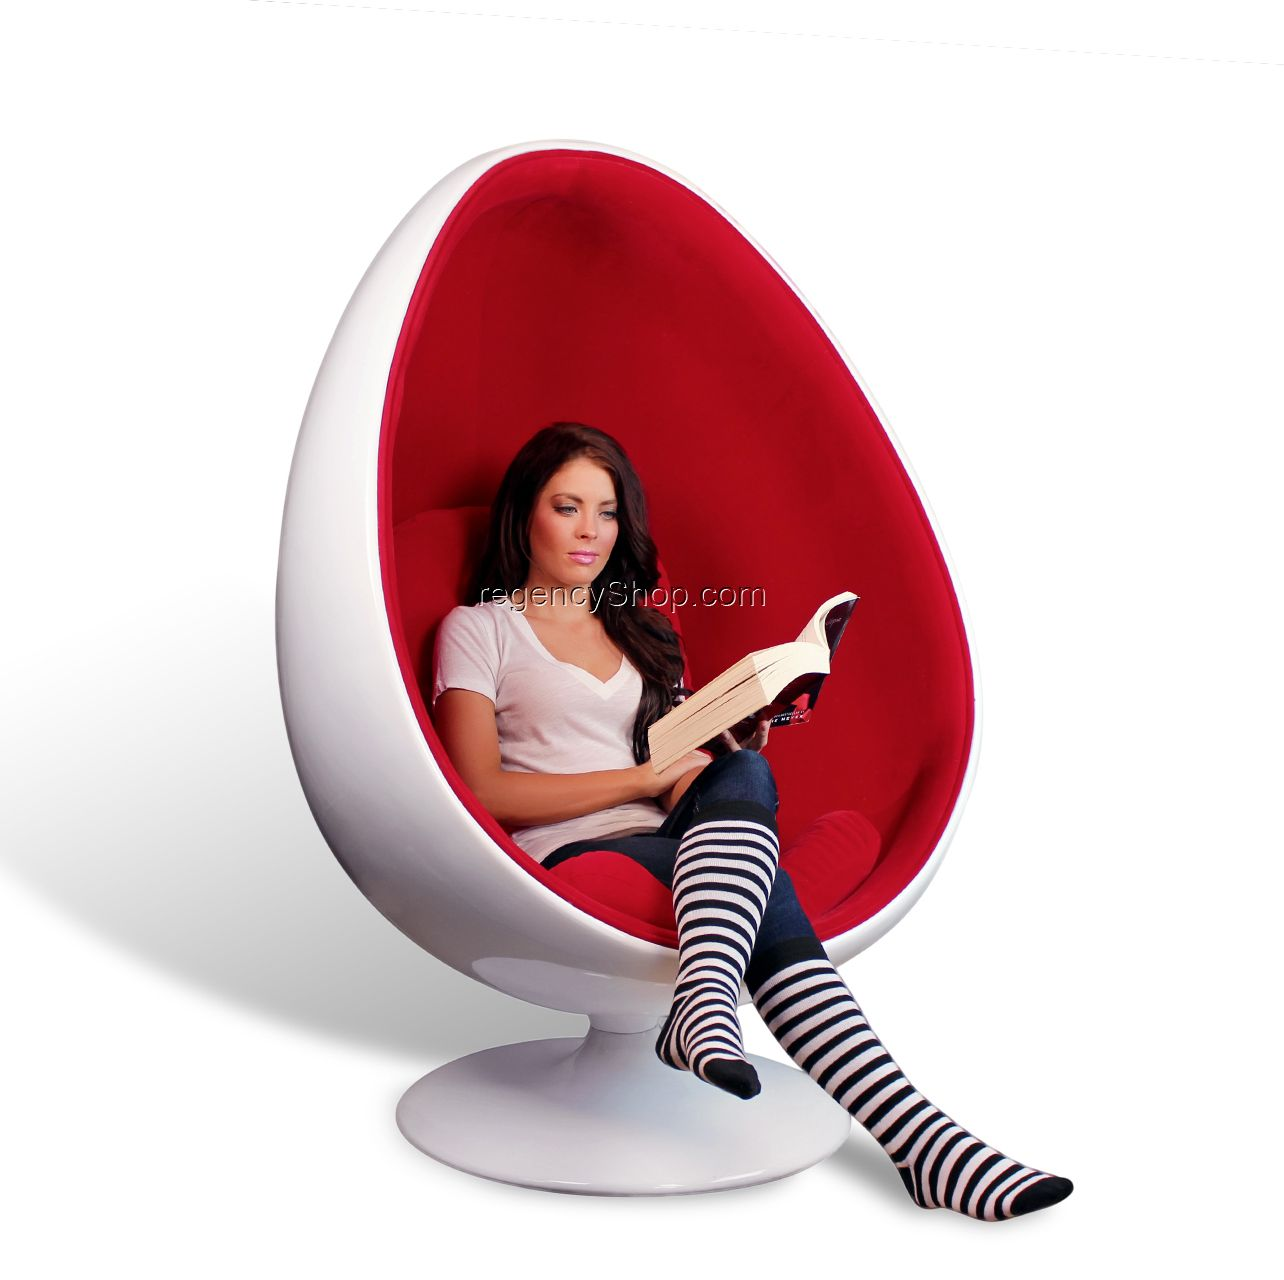 Pod Egg Chair  Living Room. Pod Egg Chair  Living Room   Future House   Pinterest   Egg chair